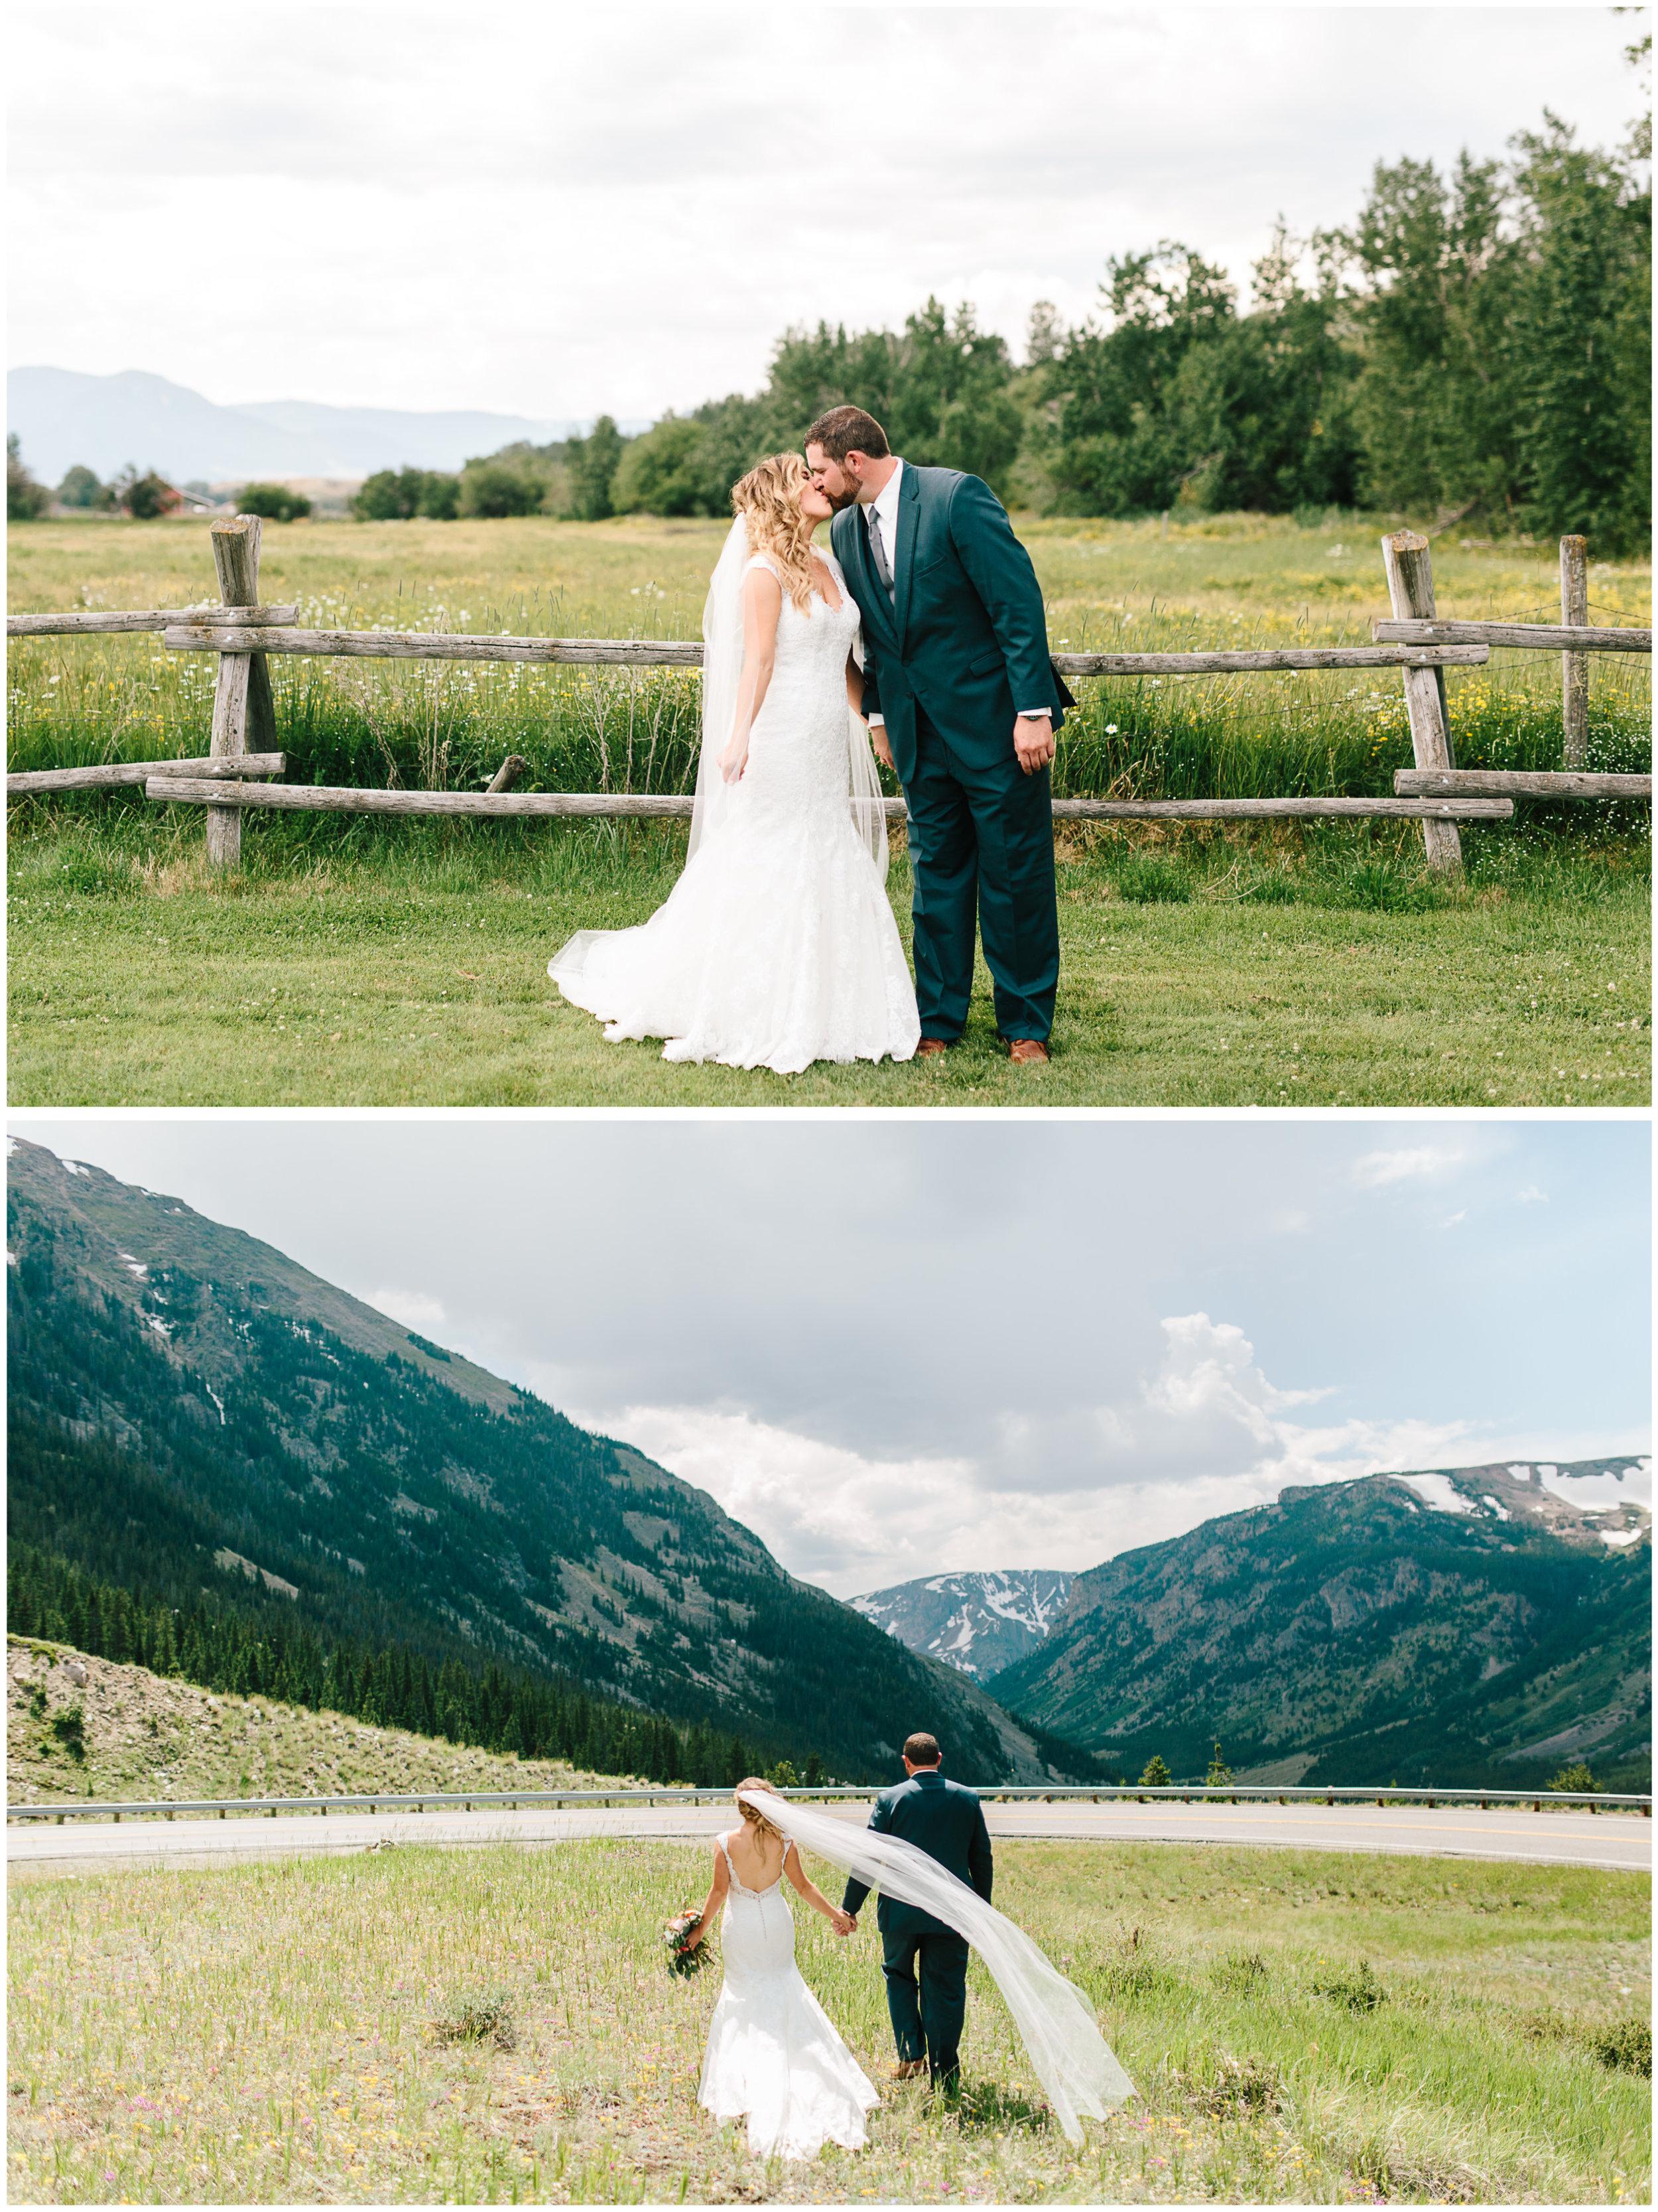 redlodge_montana_wedding_29.jpg